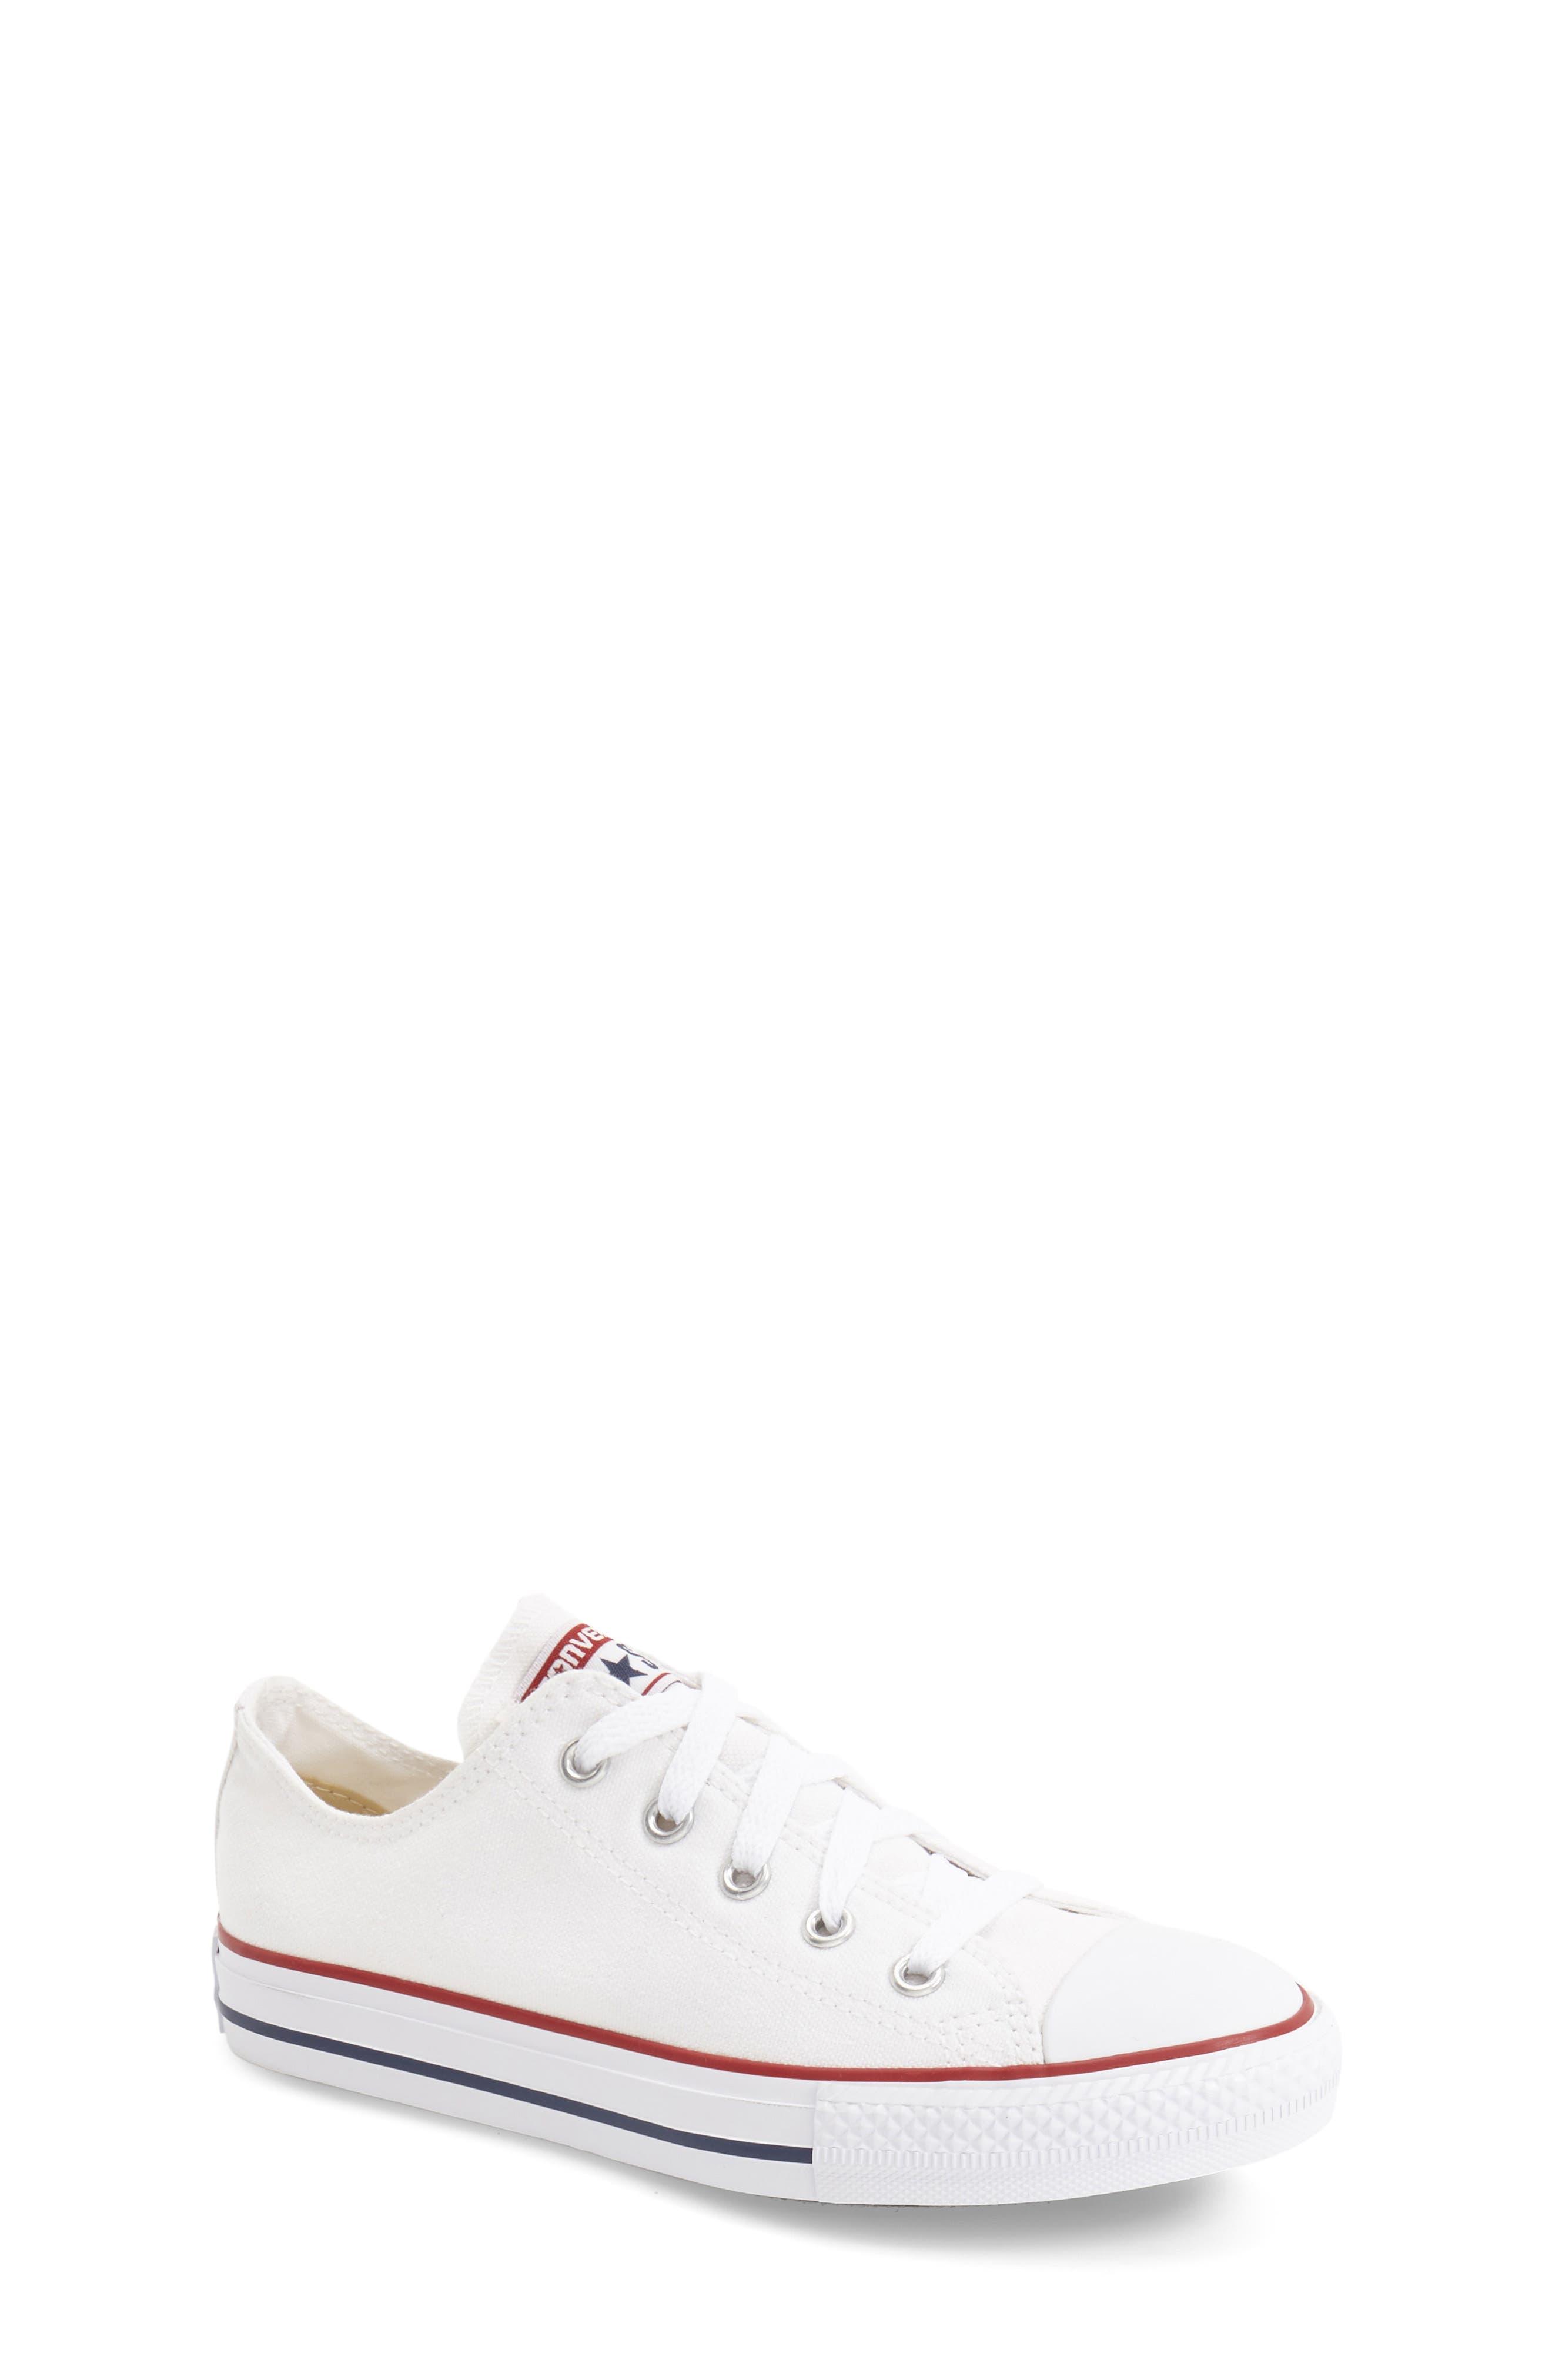 Chuck Taylor<sup>®</sup> Sneaker,                             Main thumbnail 1, color,                             White